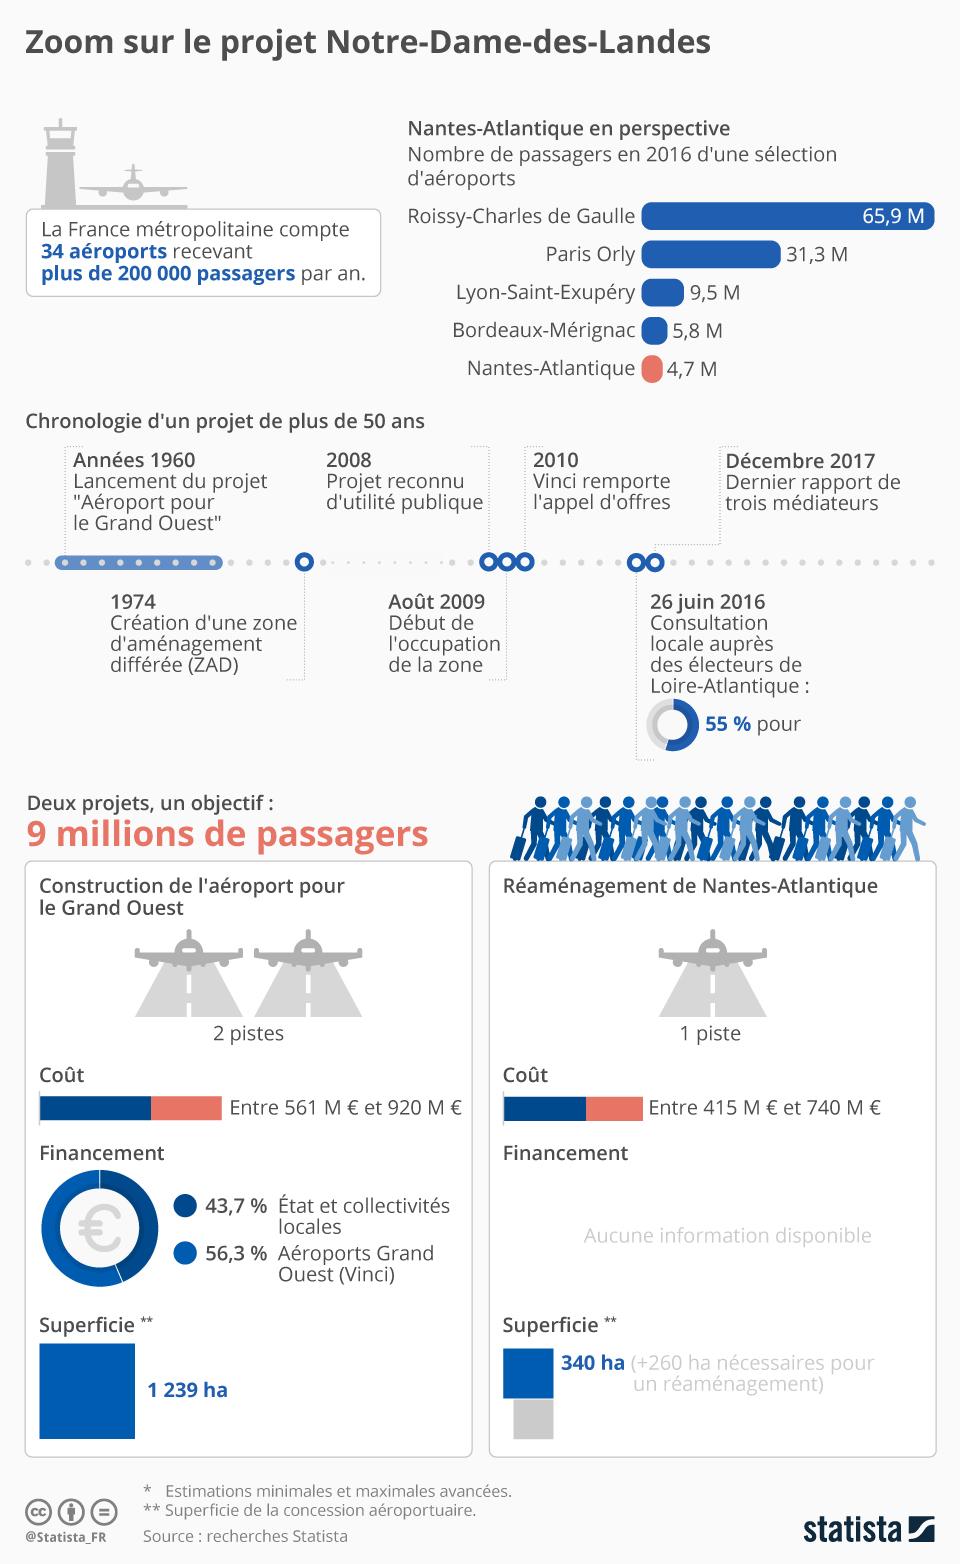 Infographie: Zoom sur le projet Notre-Dame-des-Landes   Statista